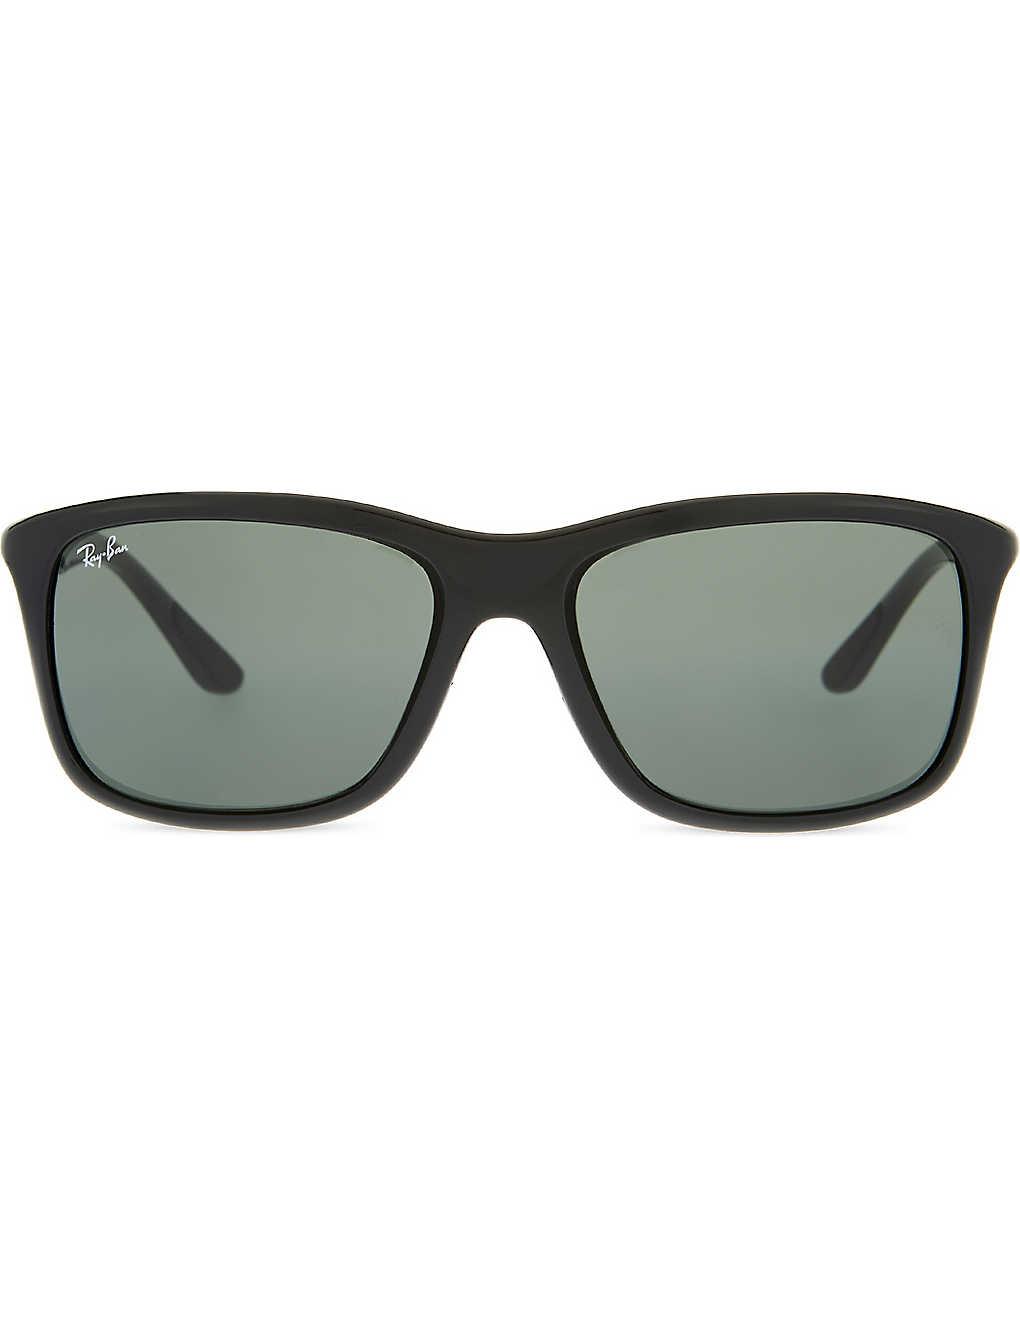 36bcec31e5c RAY-BAN - Rb8352 square-frame sunglasses